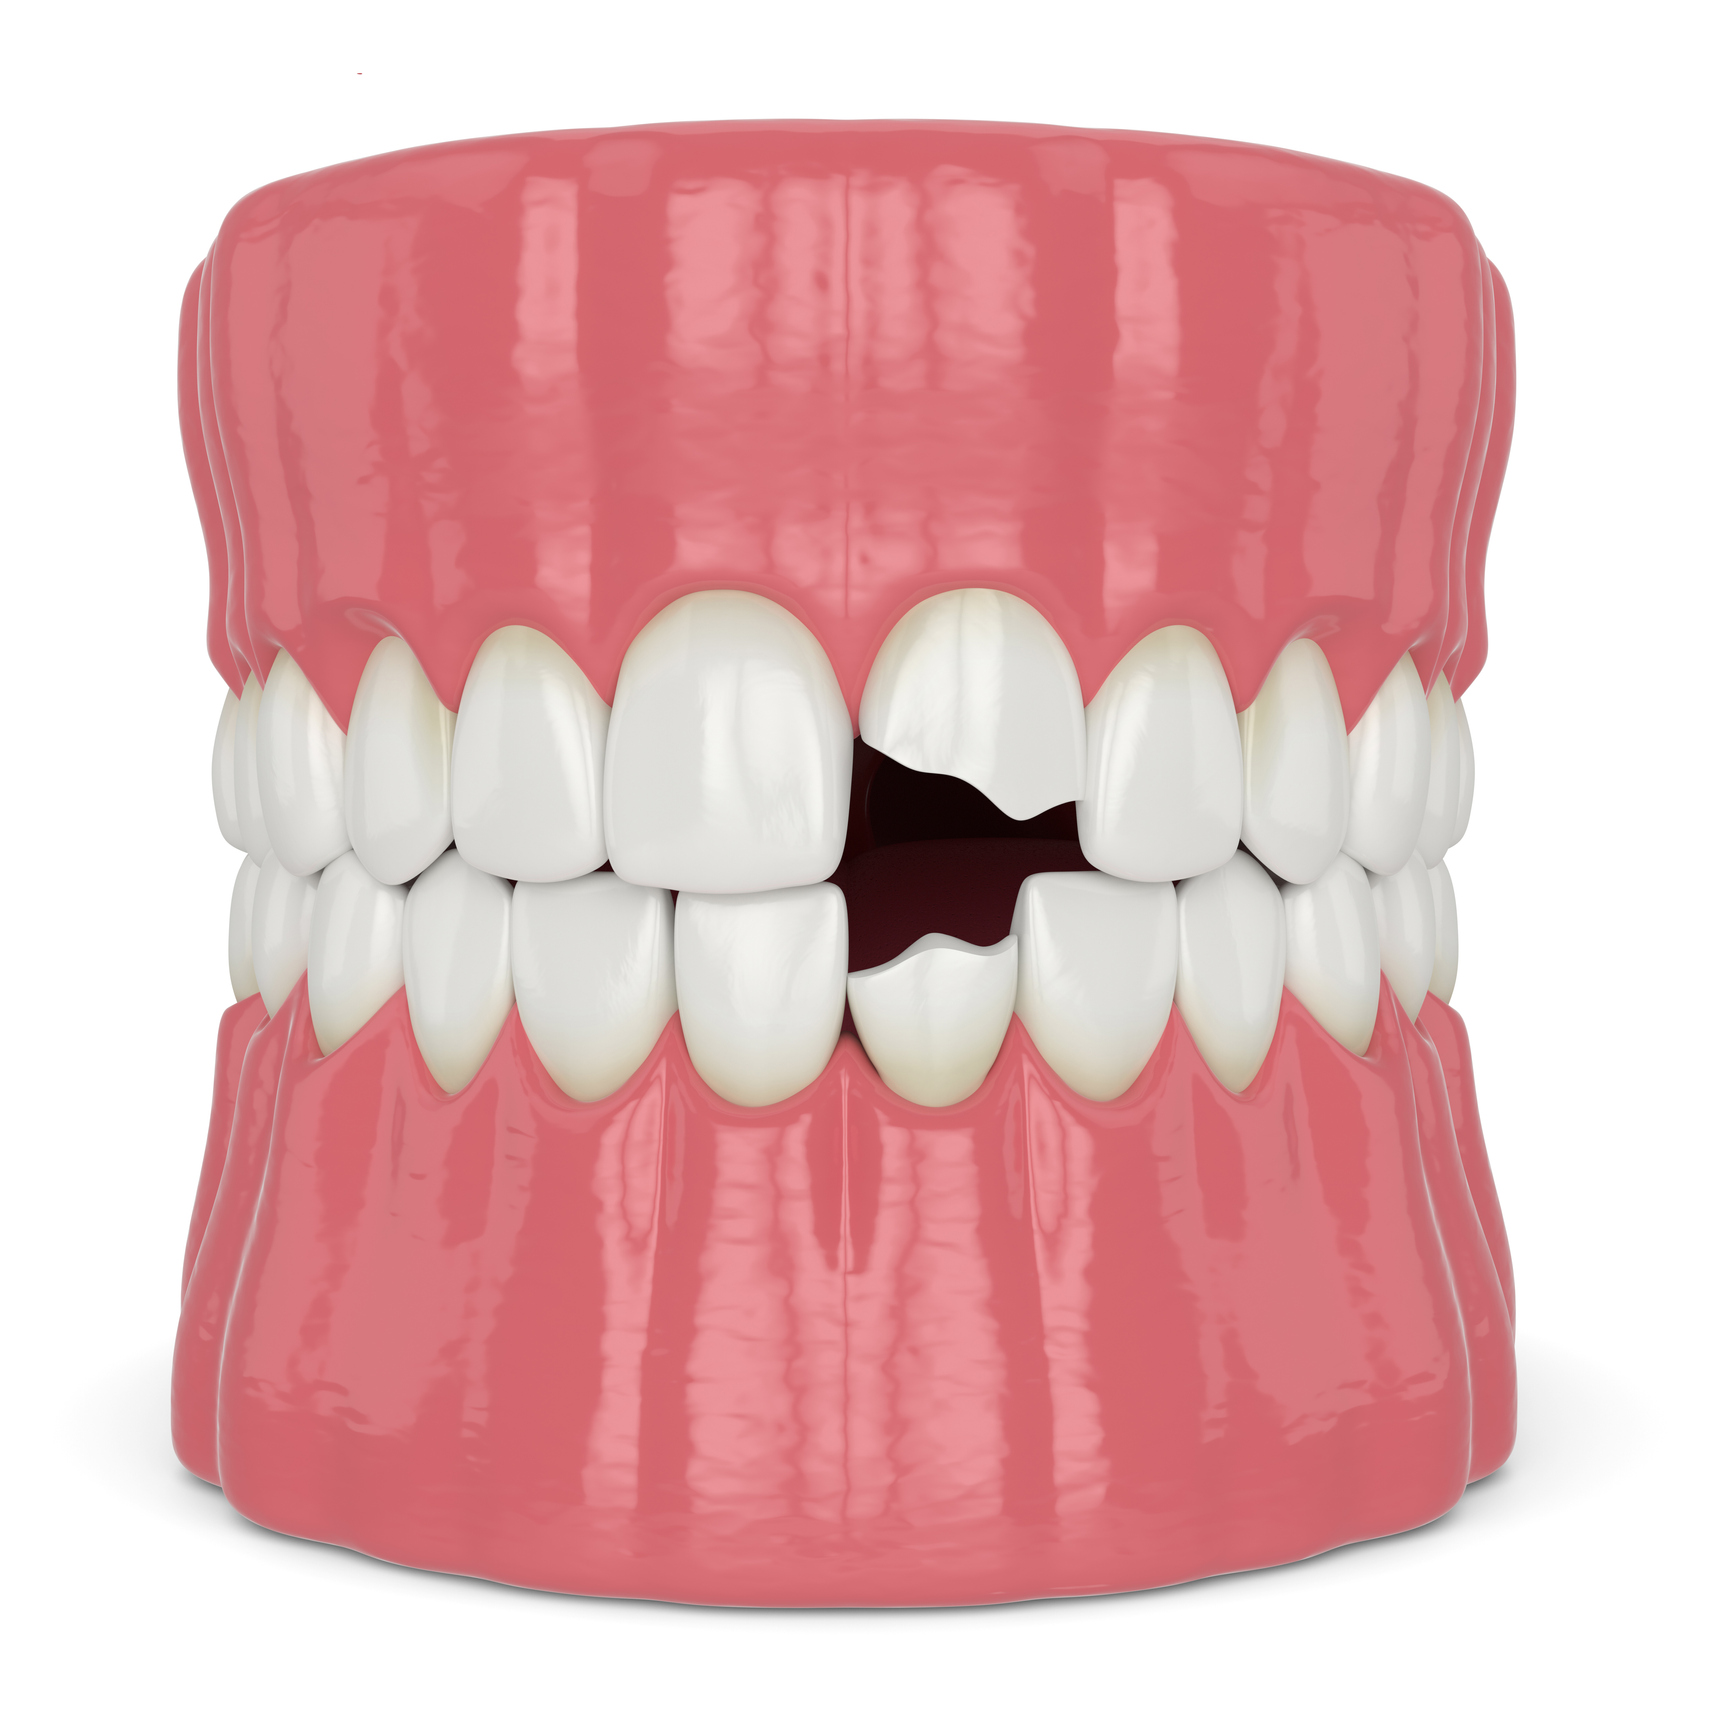 3d render of jaw with broken incisors teeth